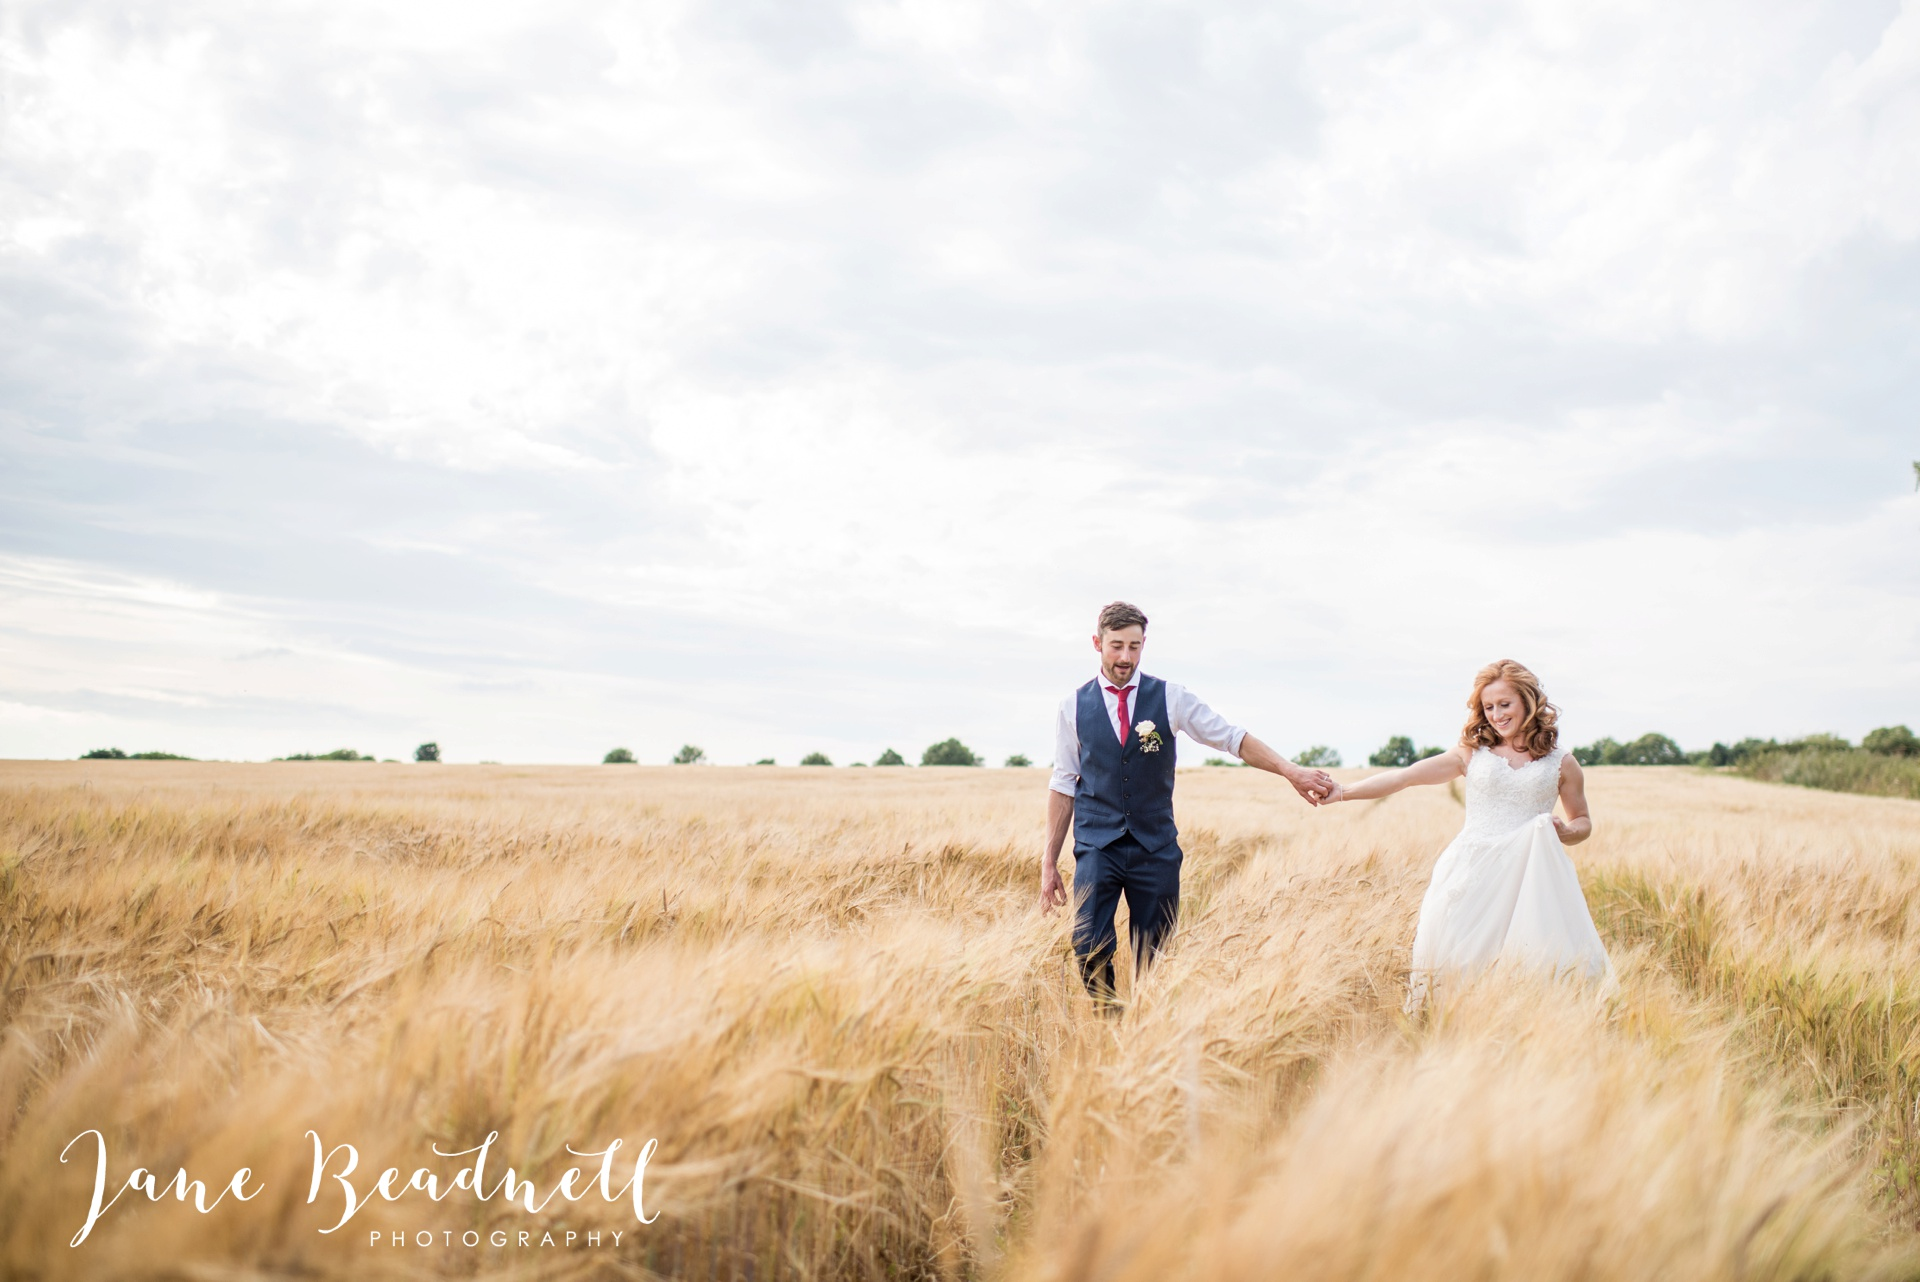 yorkshire-fine-art-wedding-photographer-jane-beadnell-photography-poppleton-york_0144